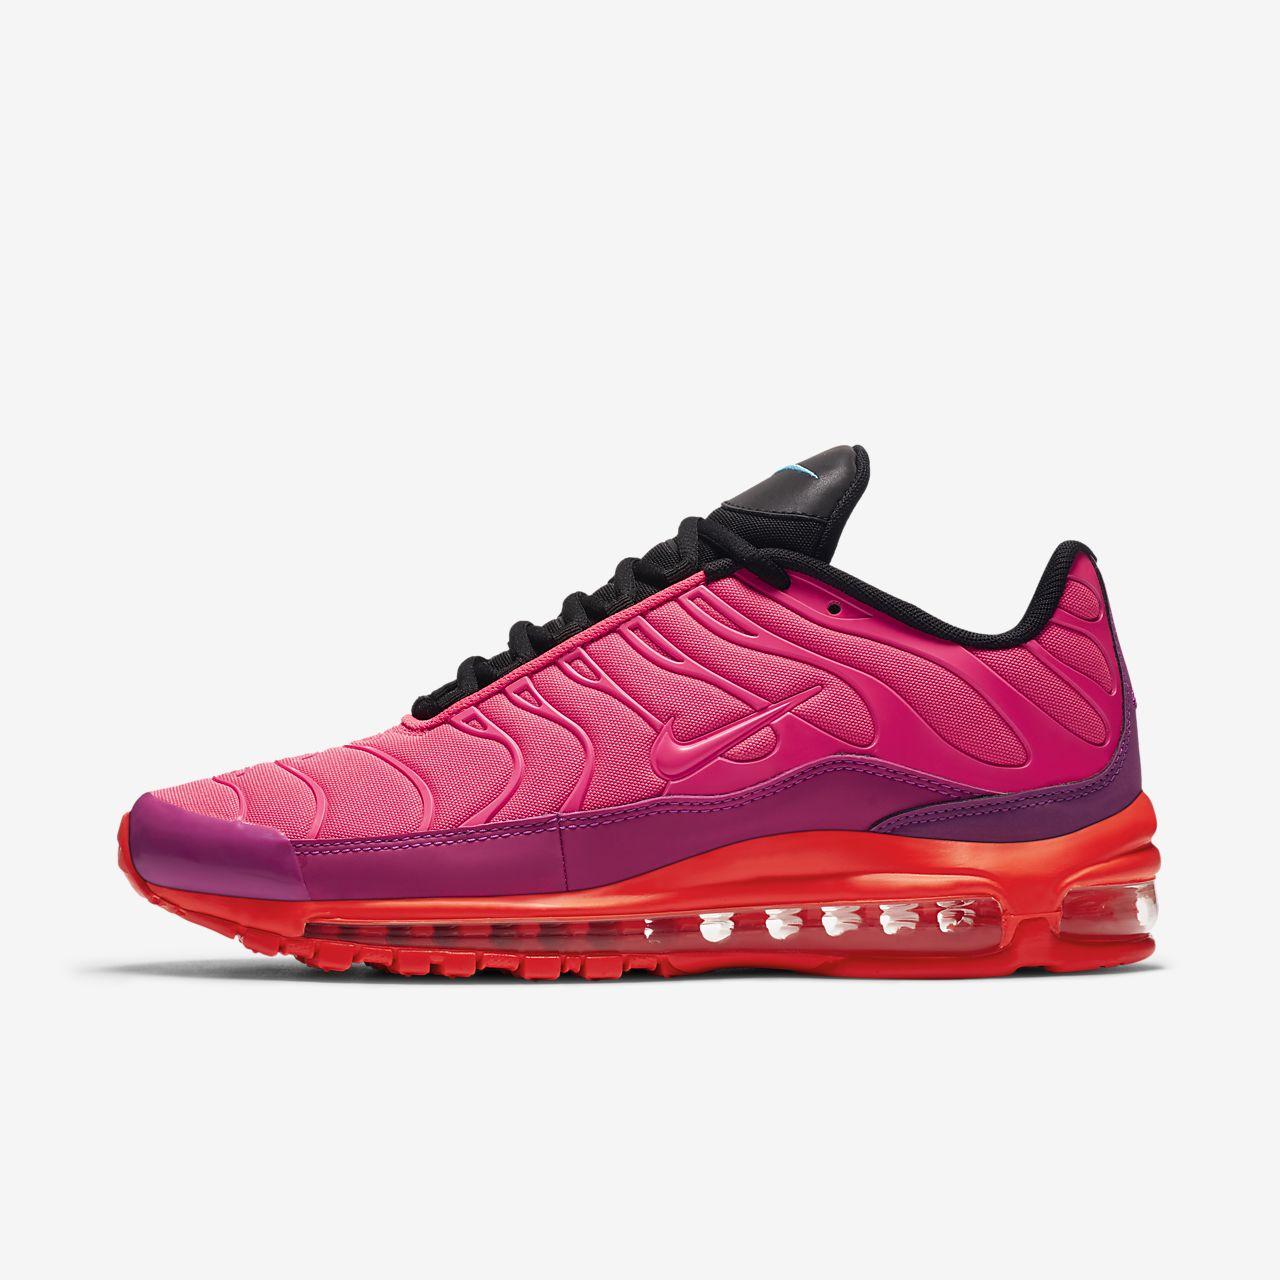 Chaussure Nike Air Max 97 Plus pour Homme